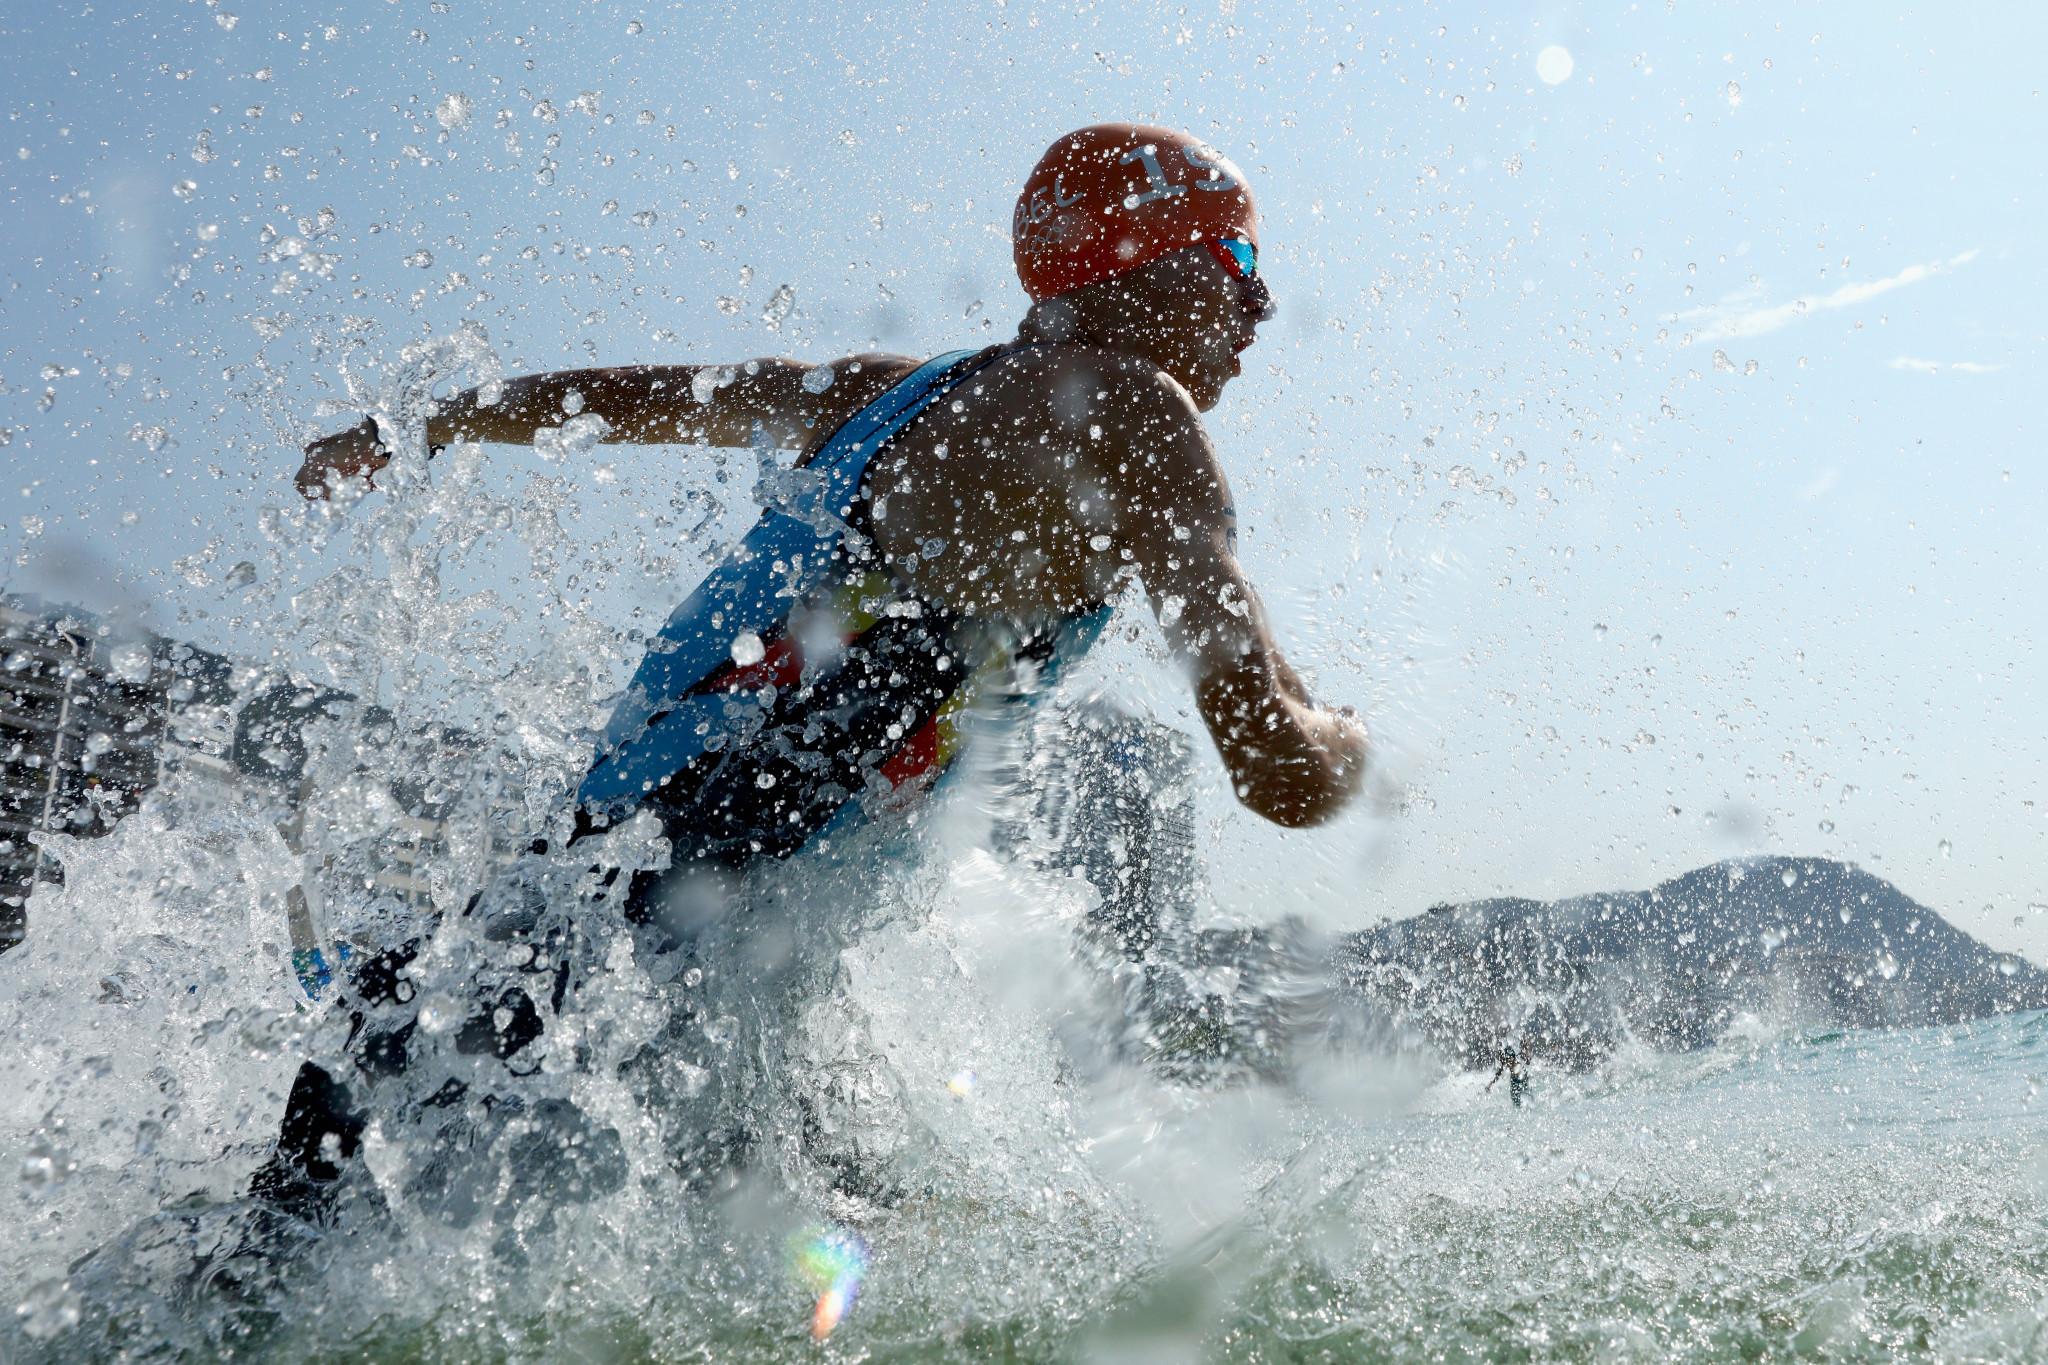 Belgium hoping for home success at ITU Triathlon World Cup in Antwerp